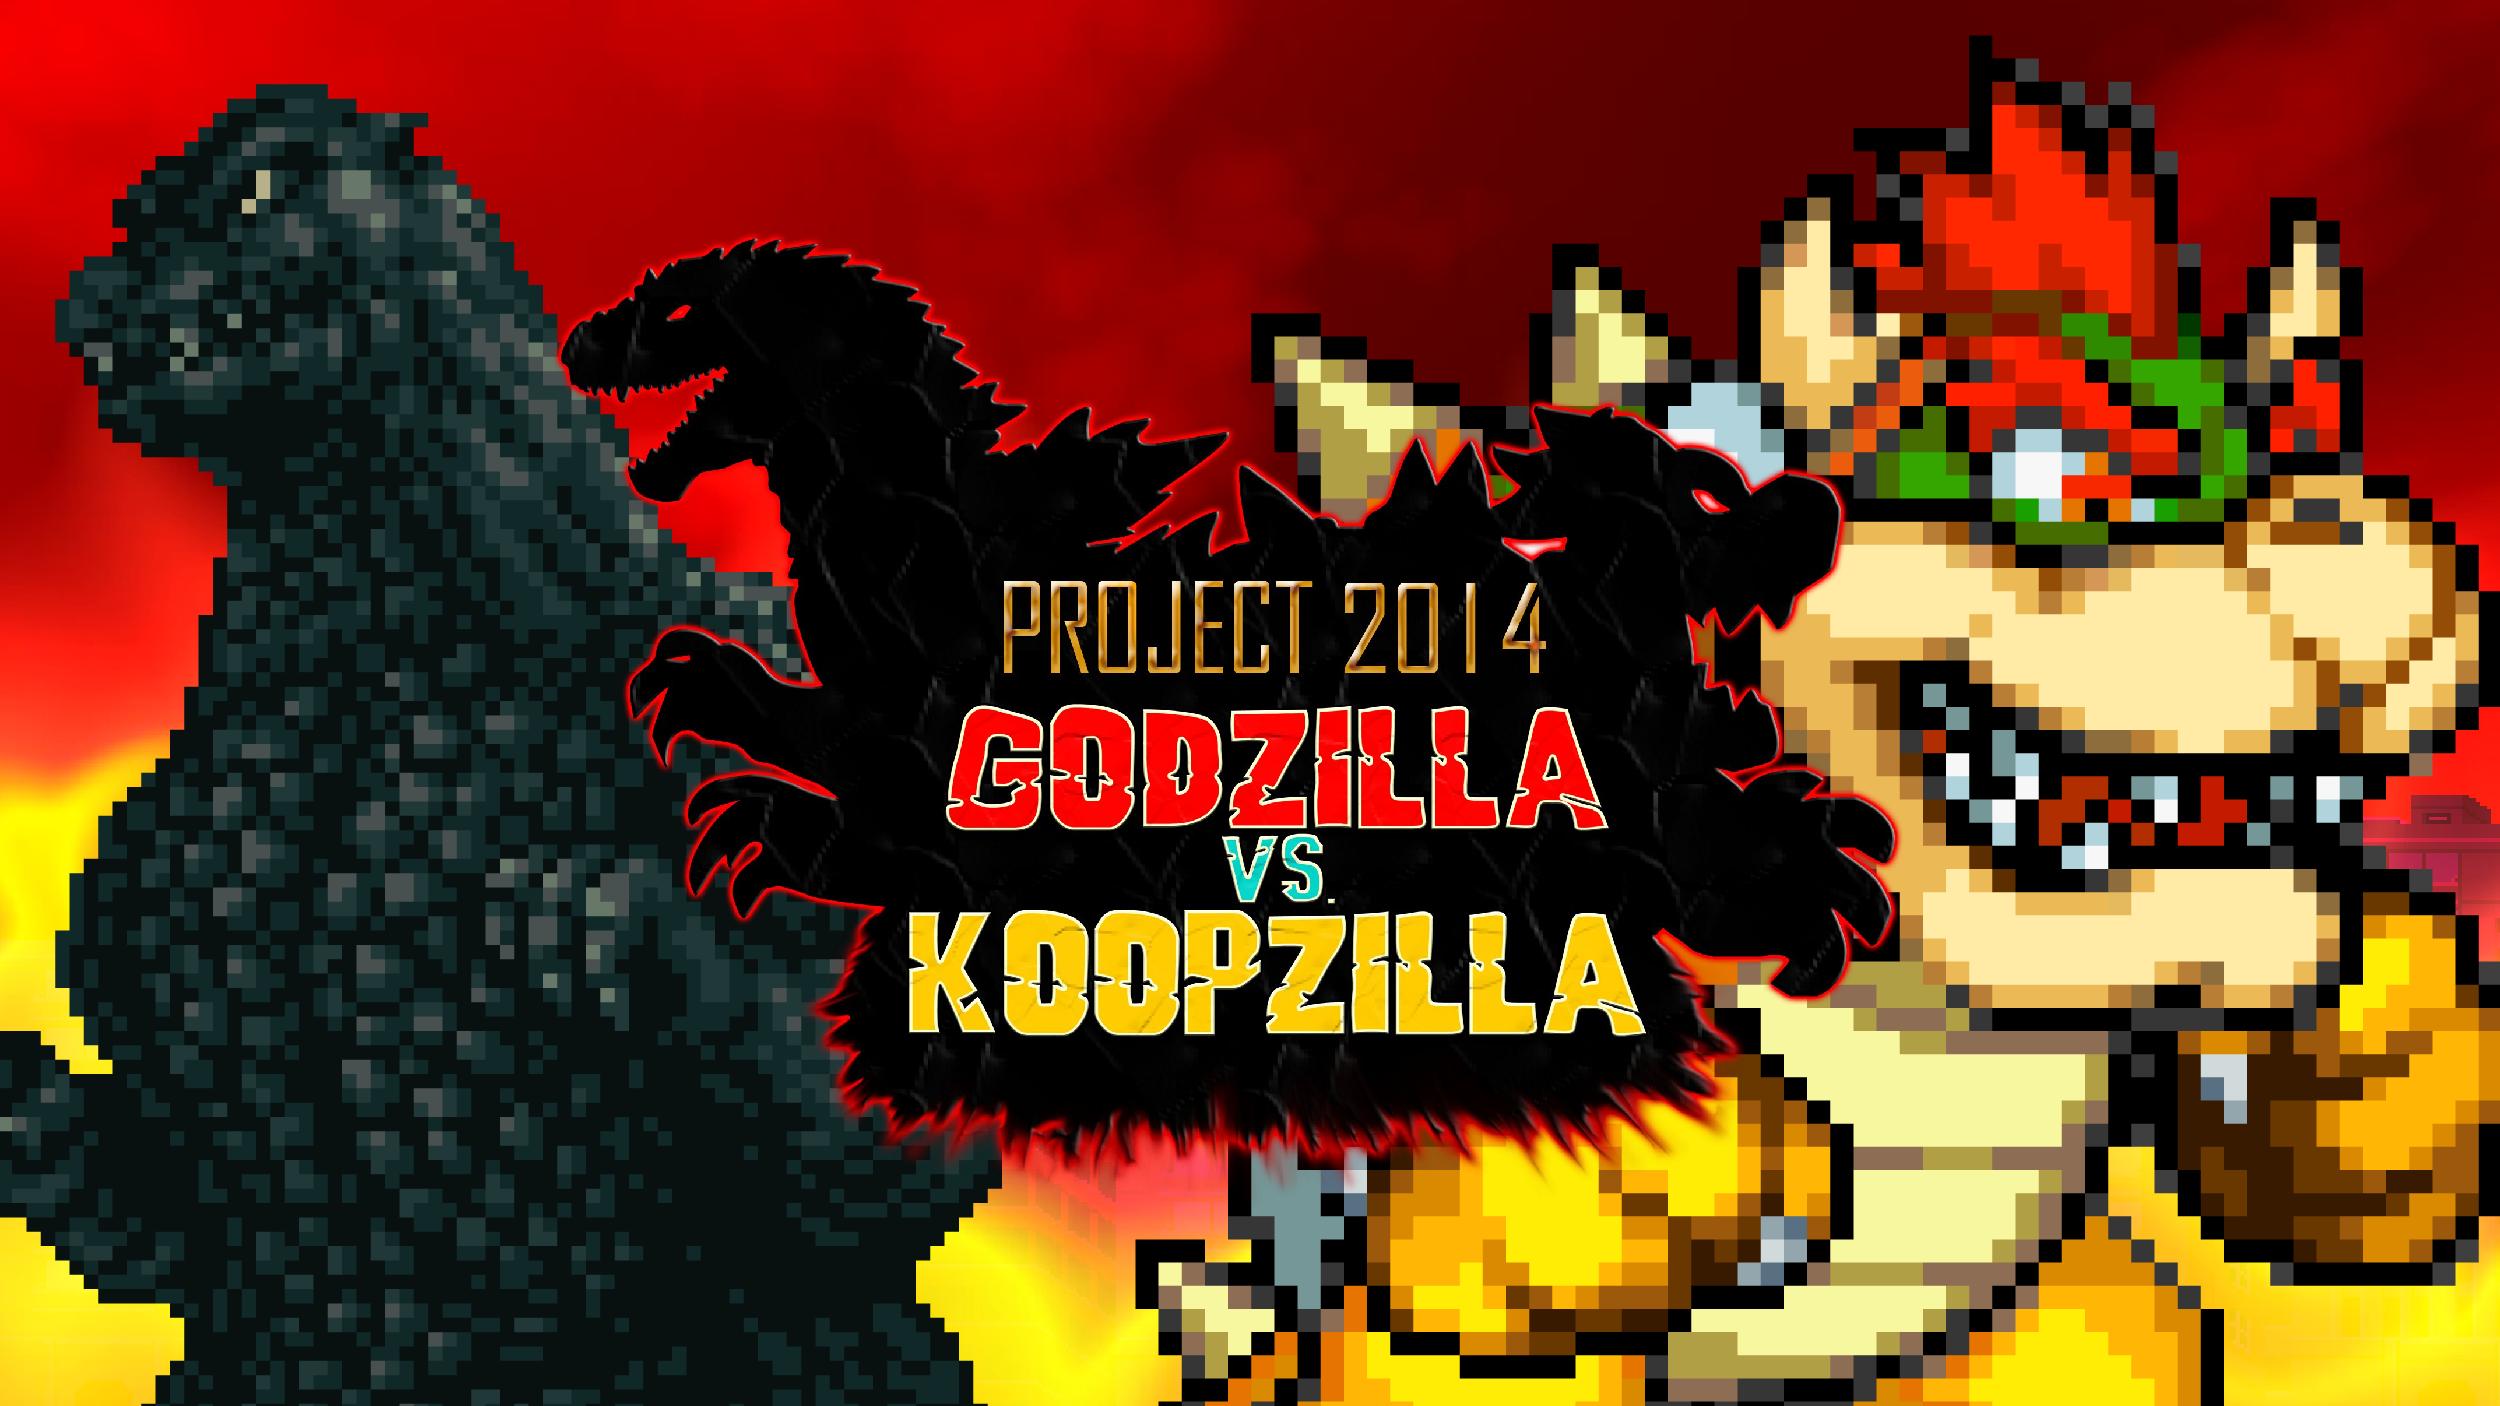 Godzilla vs. Koopzilla Teaser Trailer Pic by KingAsylus91